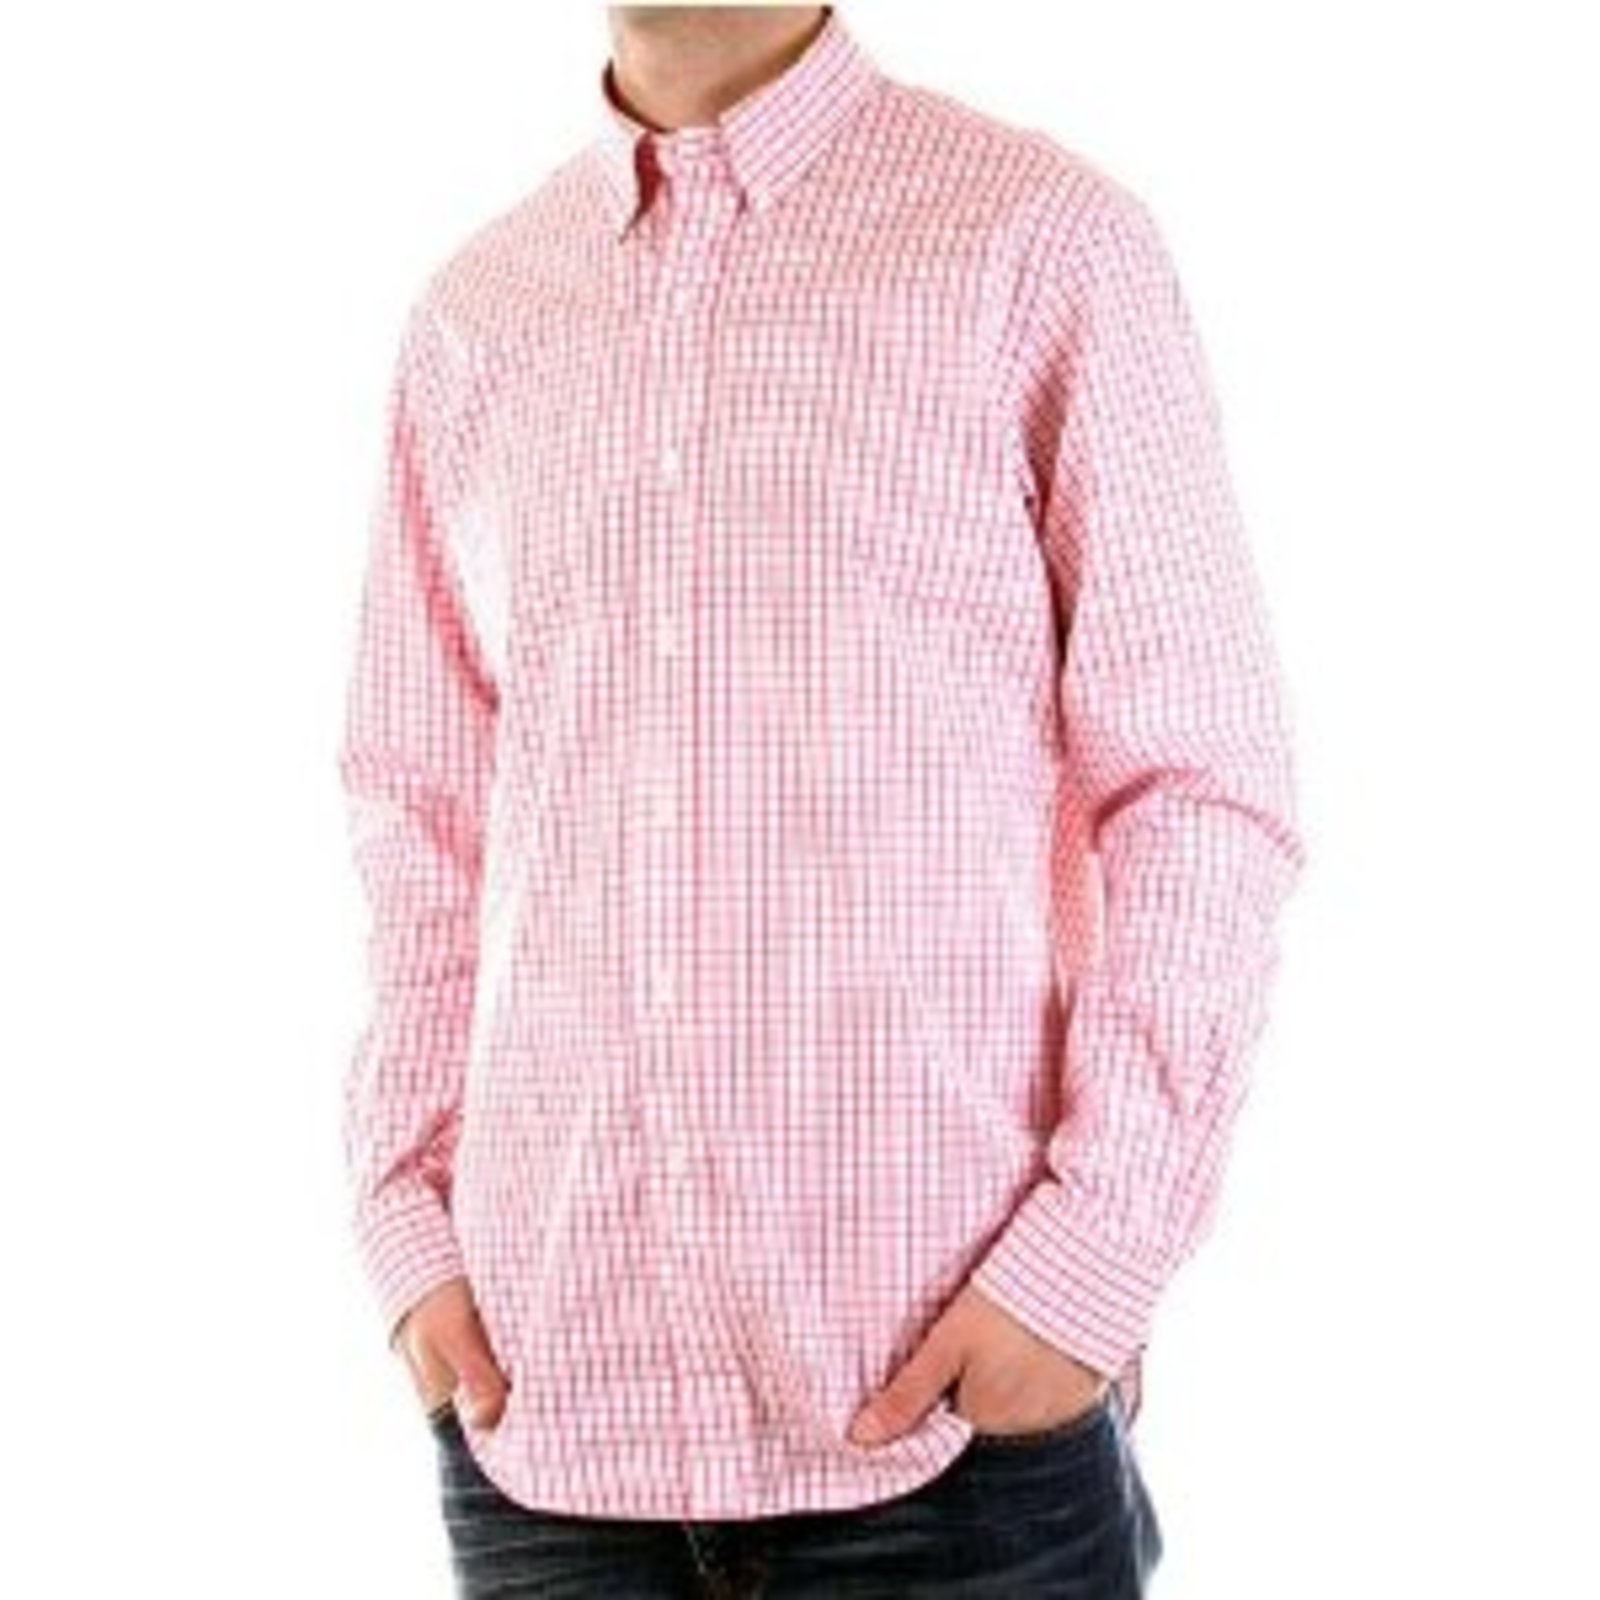 Polo Ralph Lauren Shirt Long Sleeve Check Shirt Polo4171